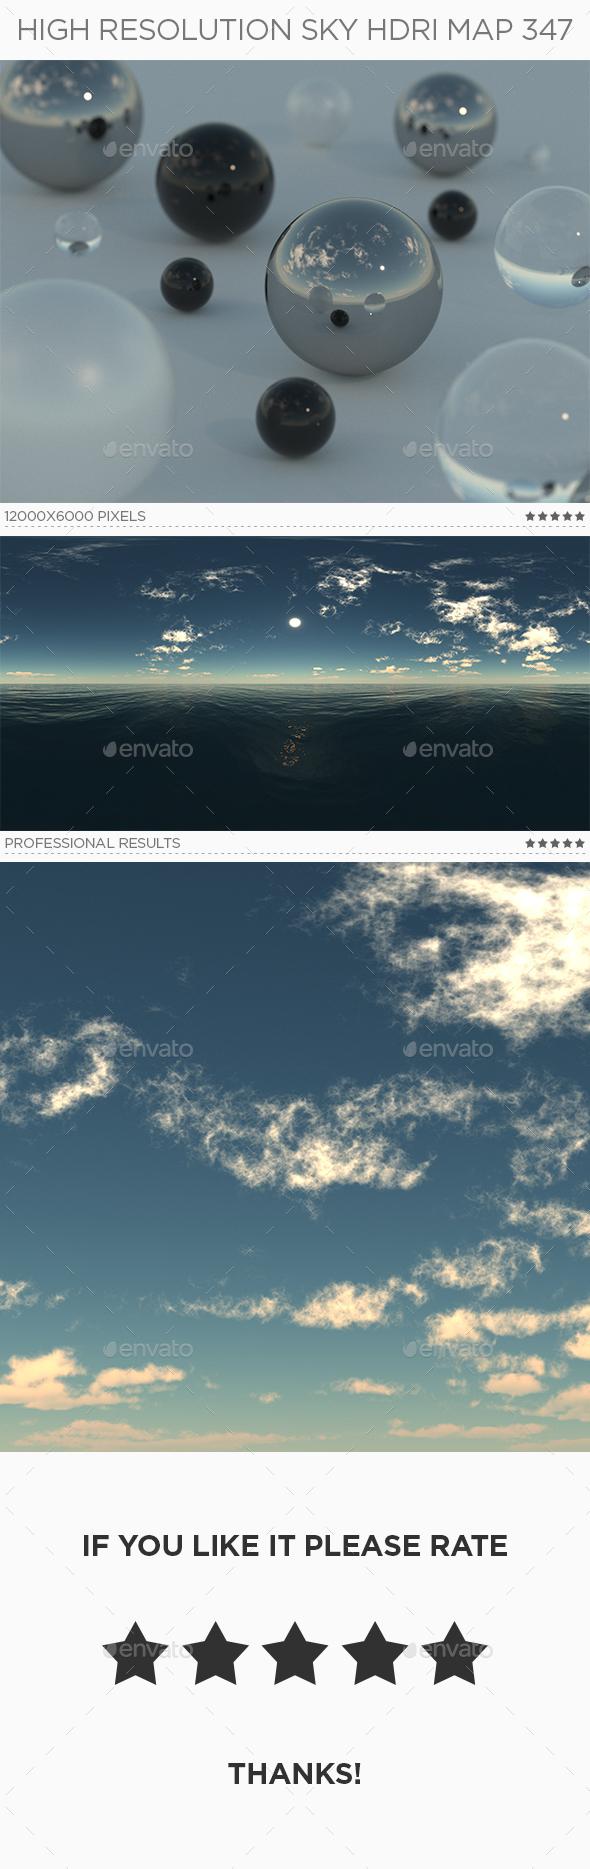 High Resolution Sky HDRi Map 347 - 3DOcean Item for Sale